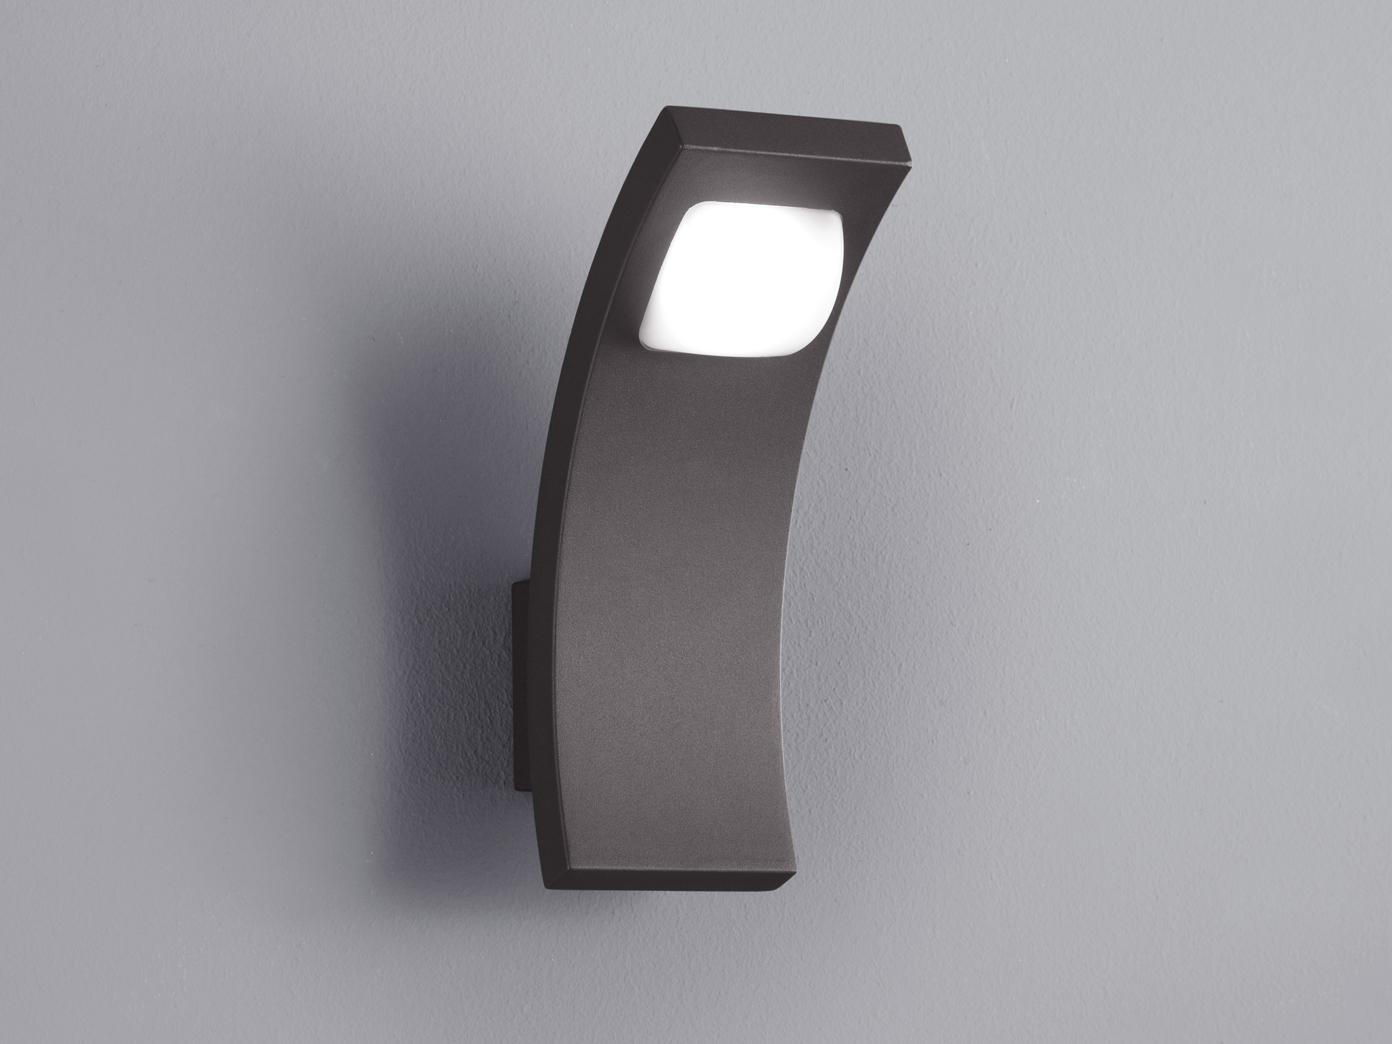 au en wandleuchte seine anthrazit inkl 6 watt led 360. Black Bedroom Furniture Sets. Home Design Ideas